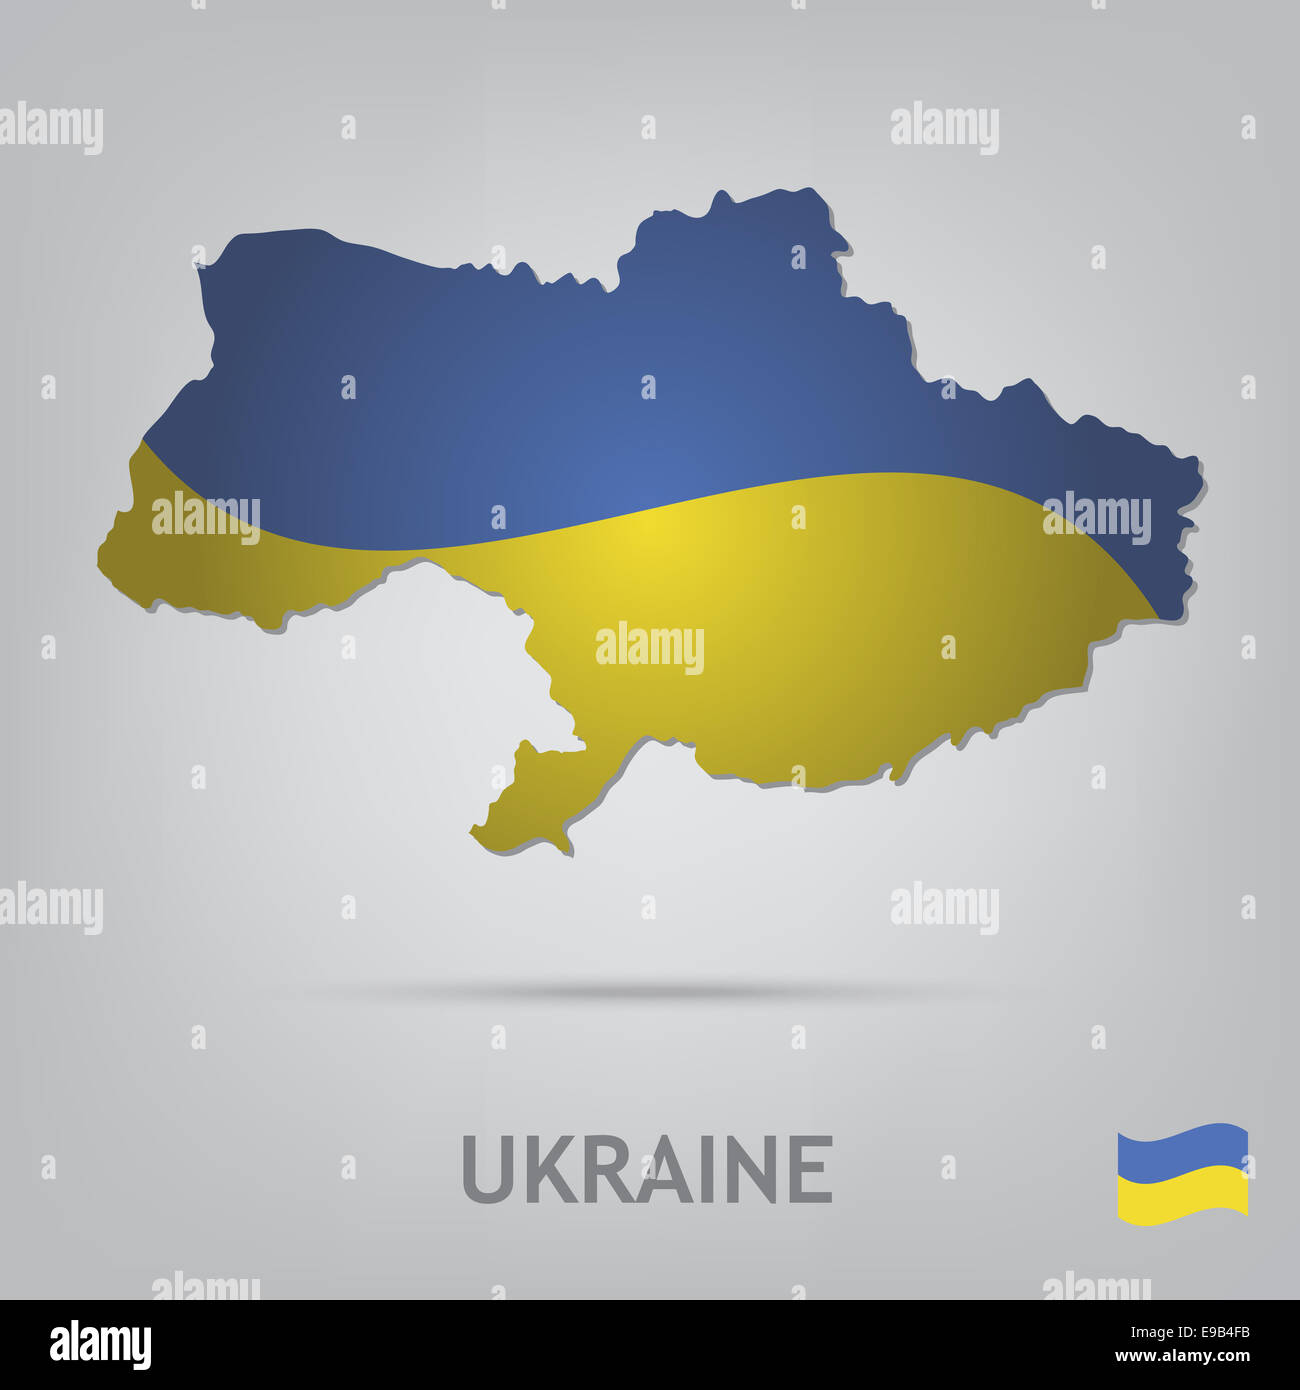 ukraine - Stock Image